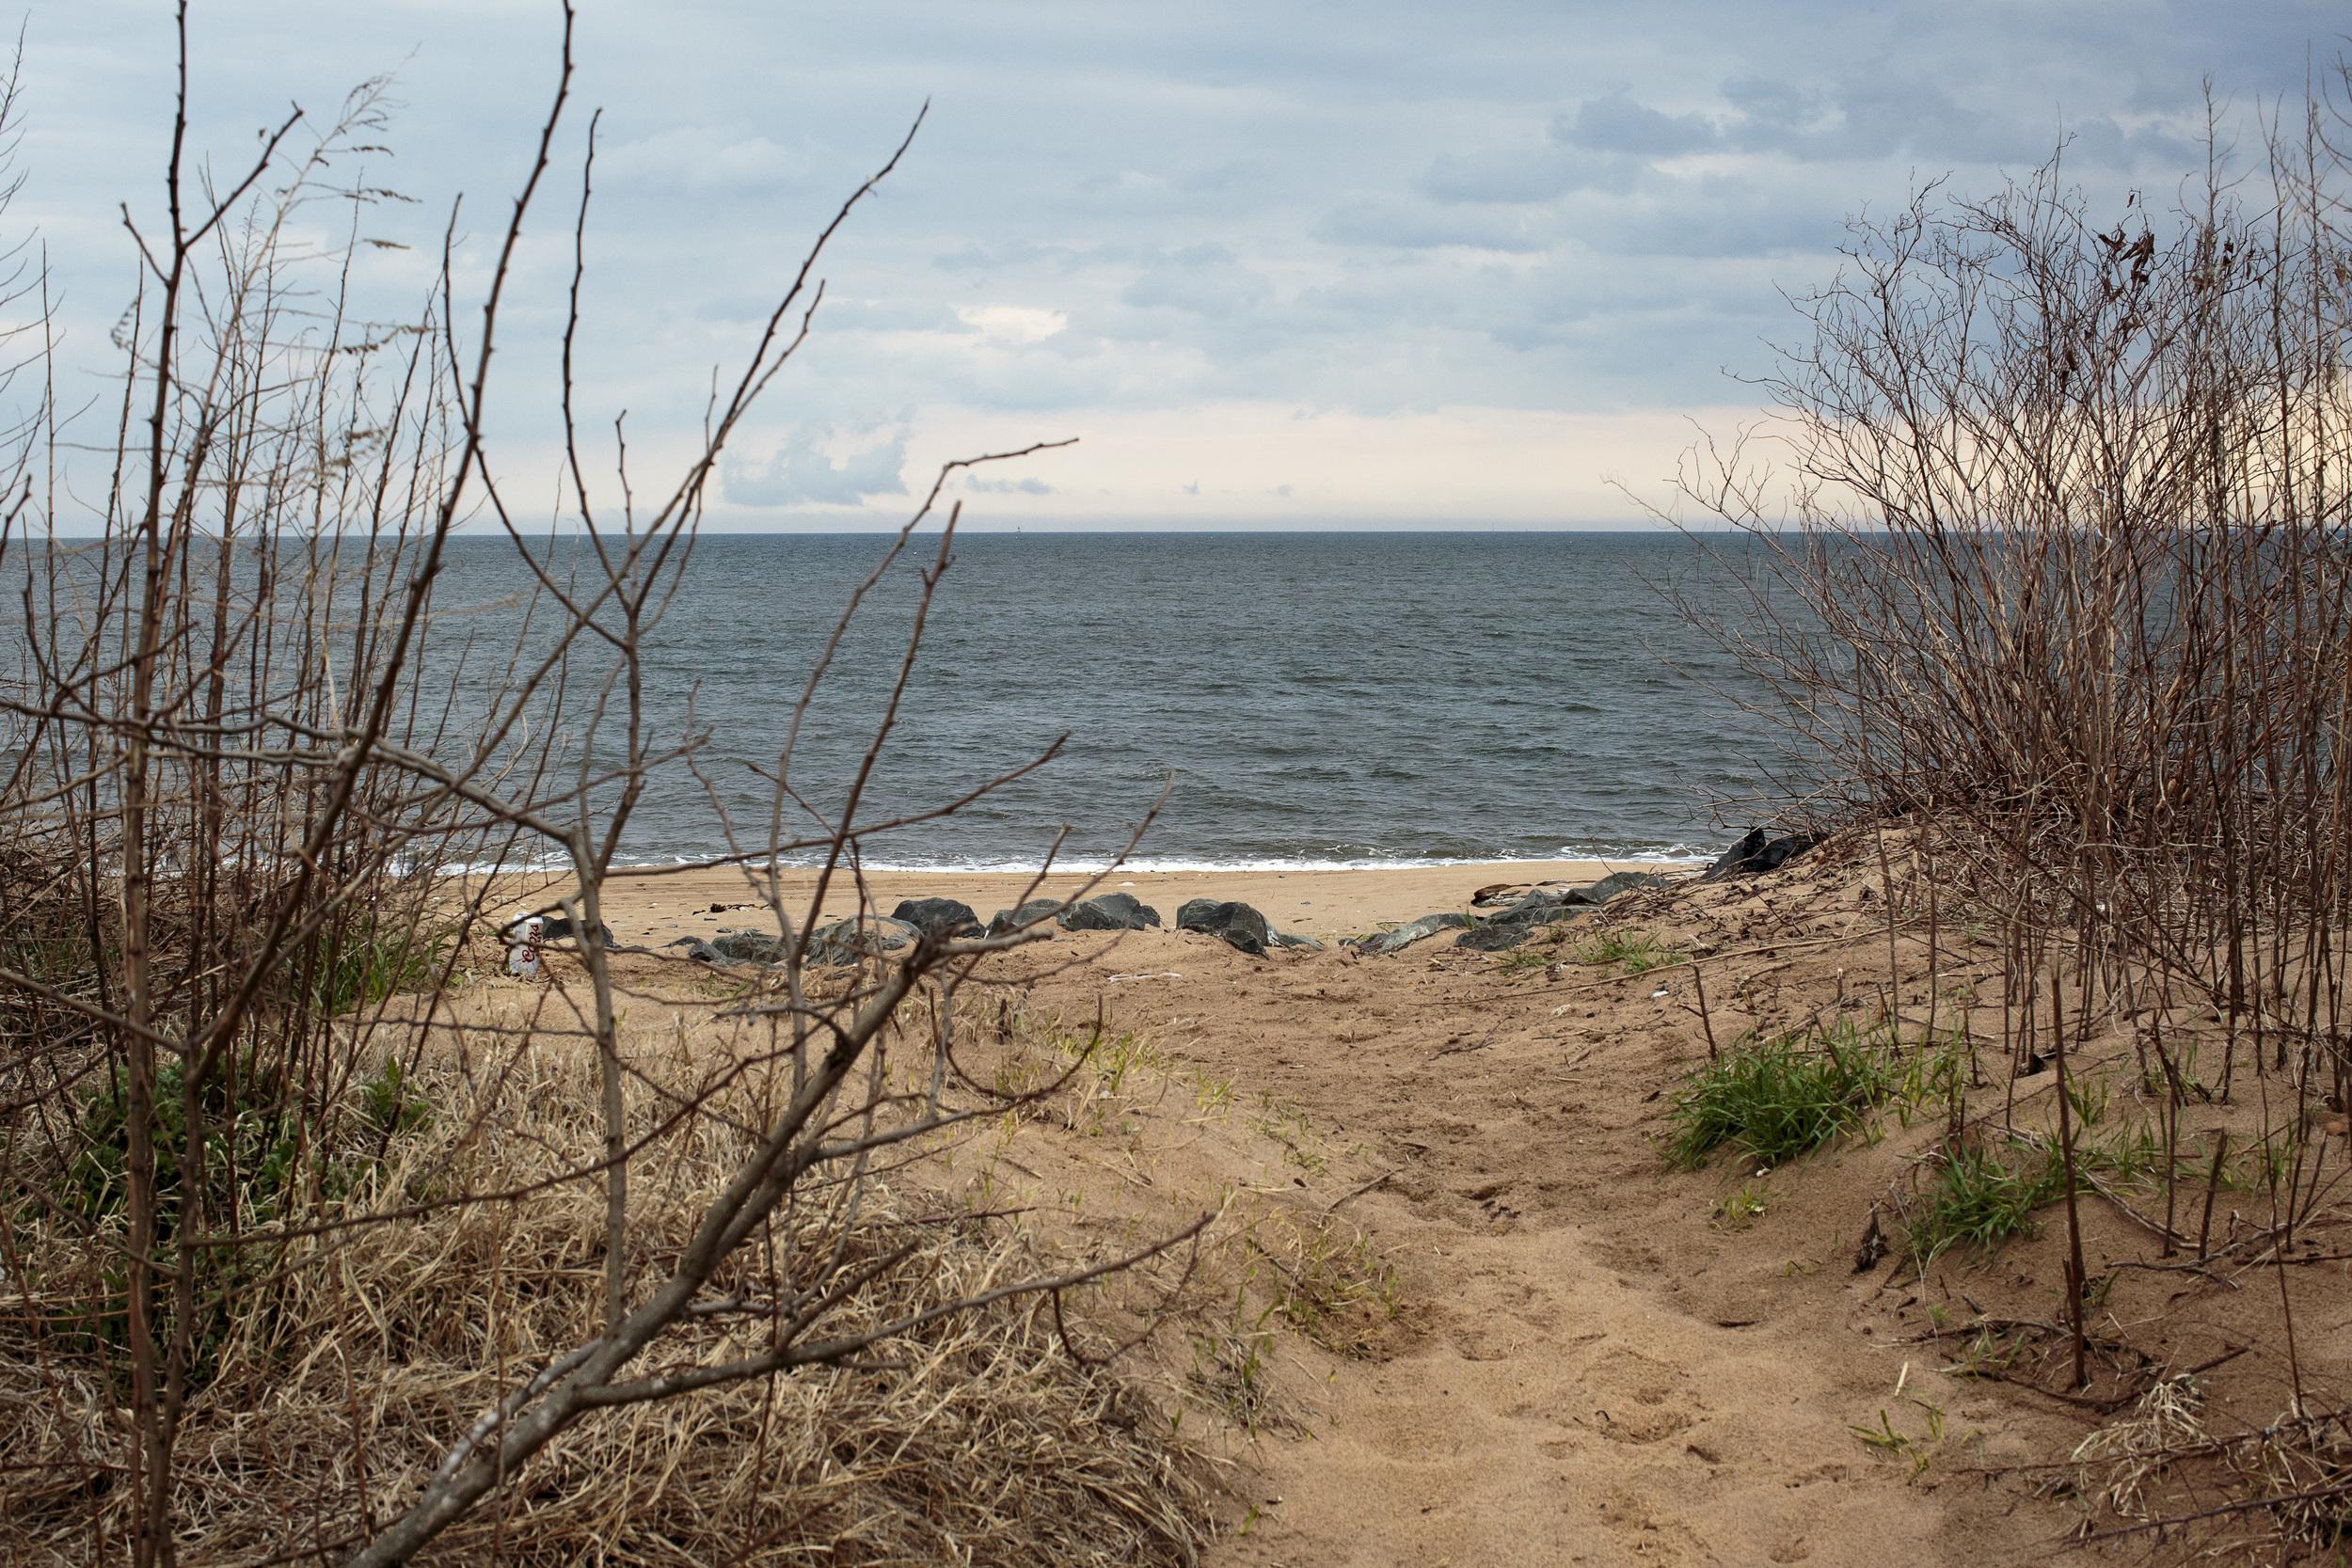 Fox_Beach_-15.jpg